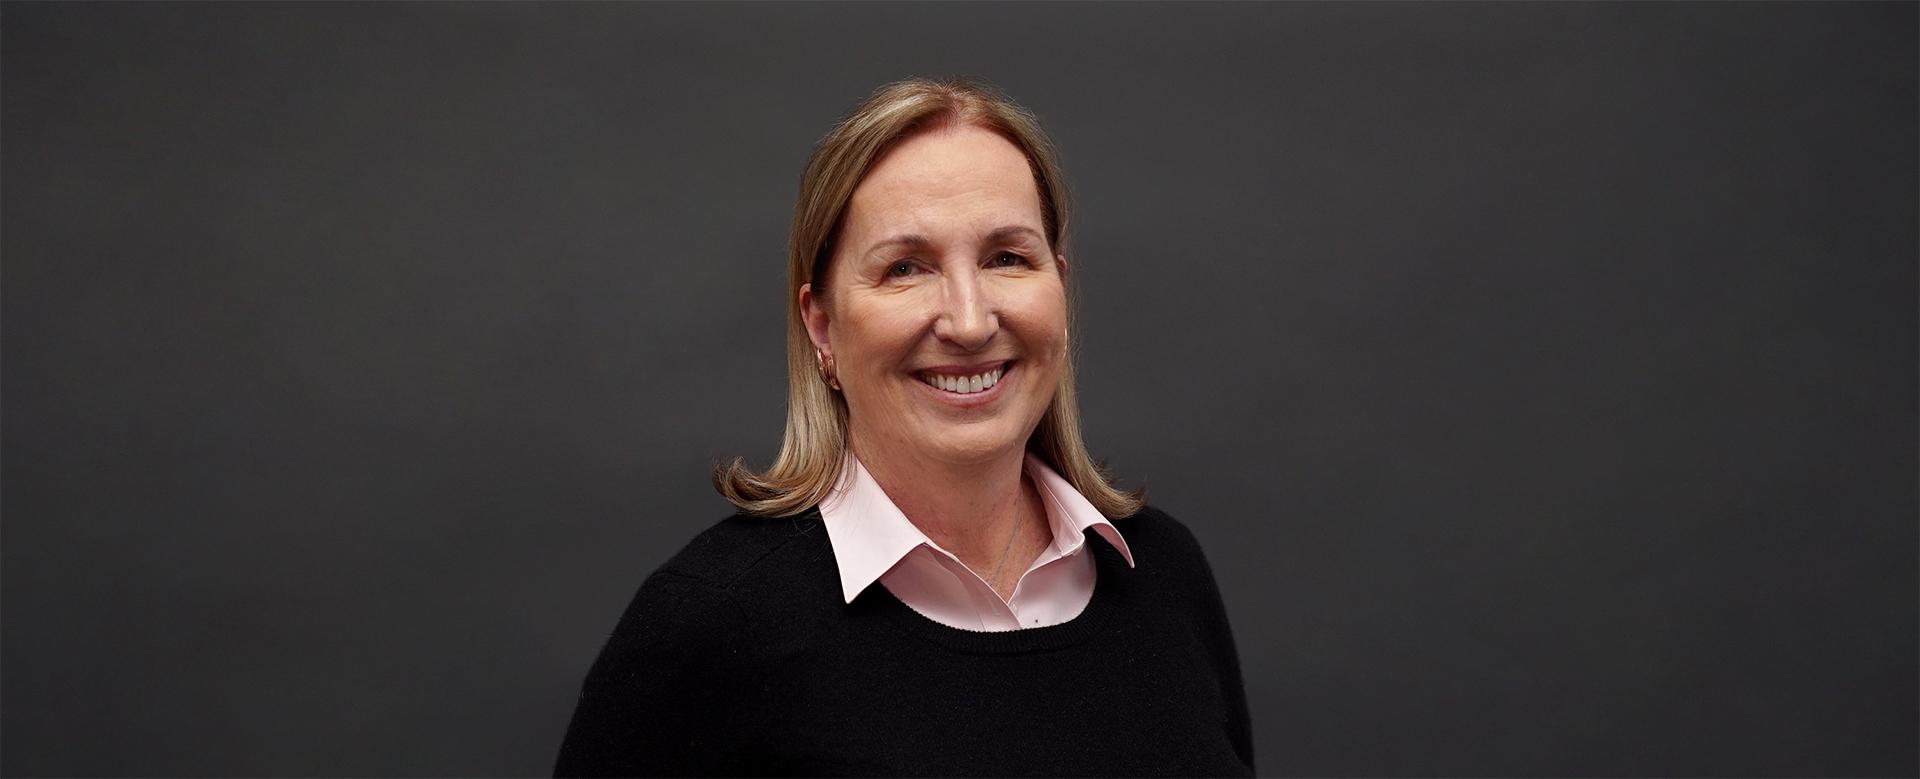 Cheryl Healton Nyu College Of Global Public Health